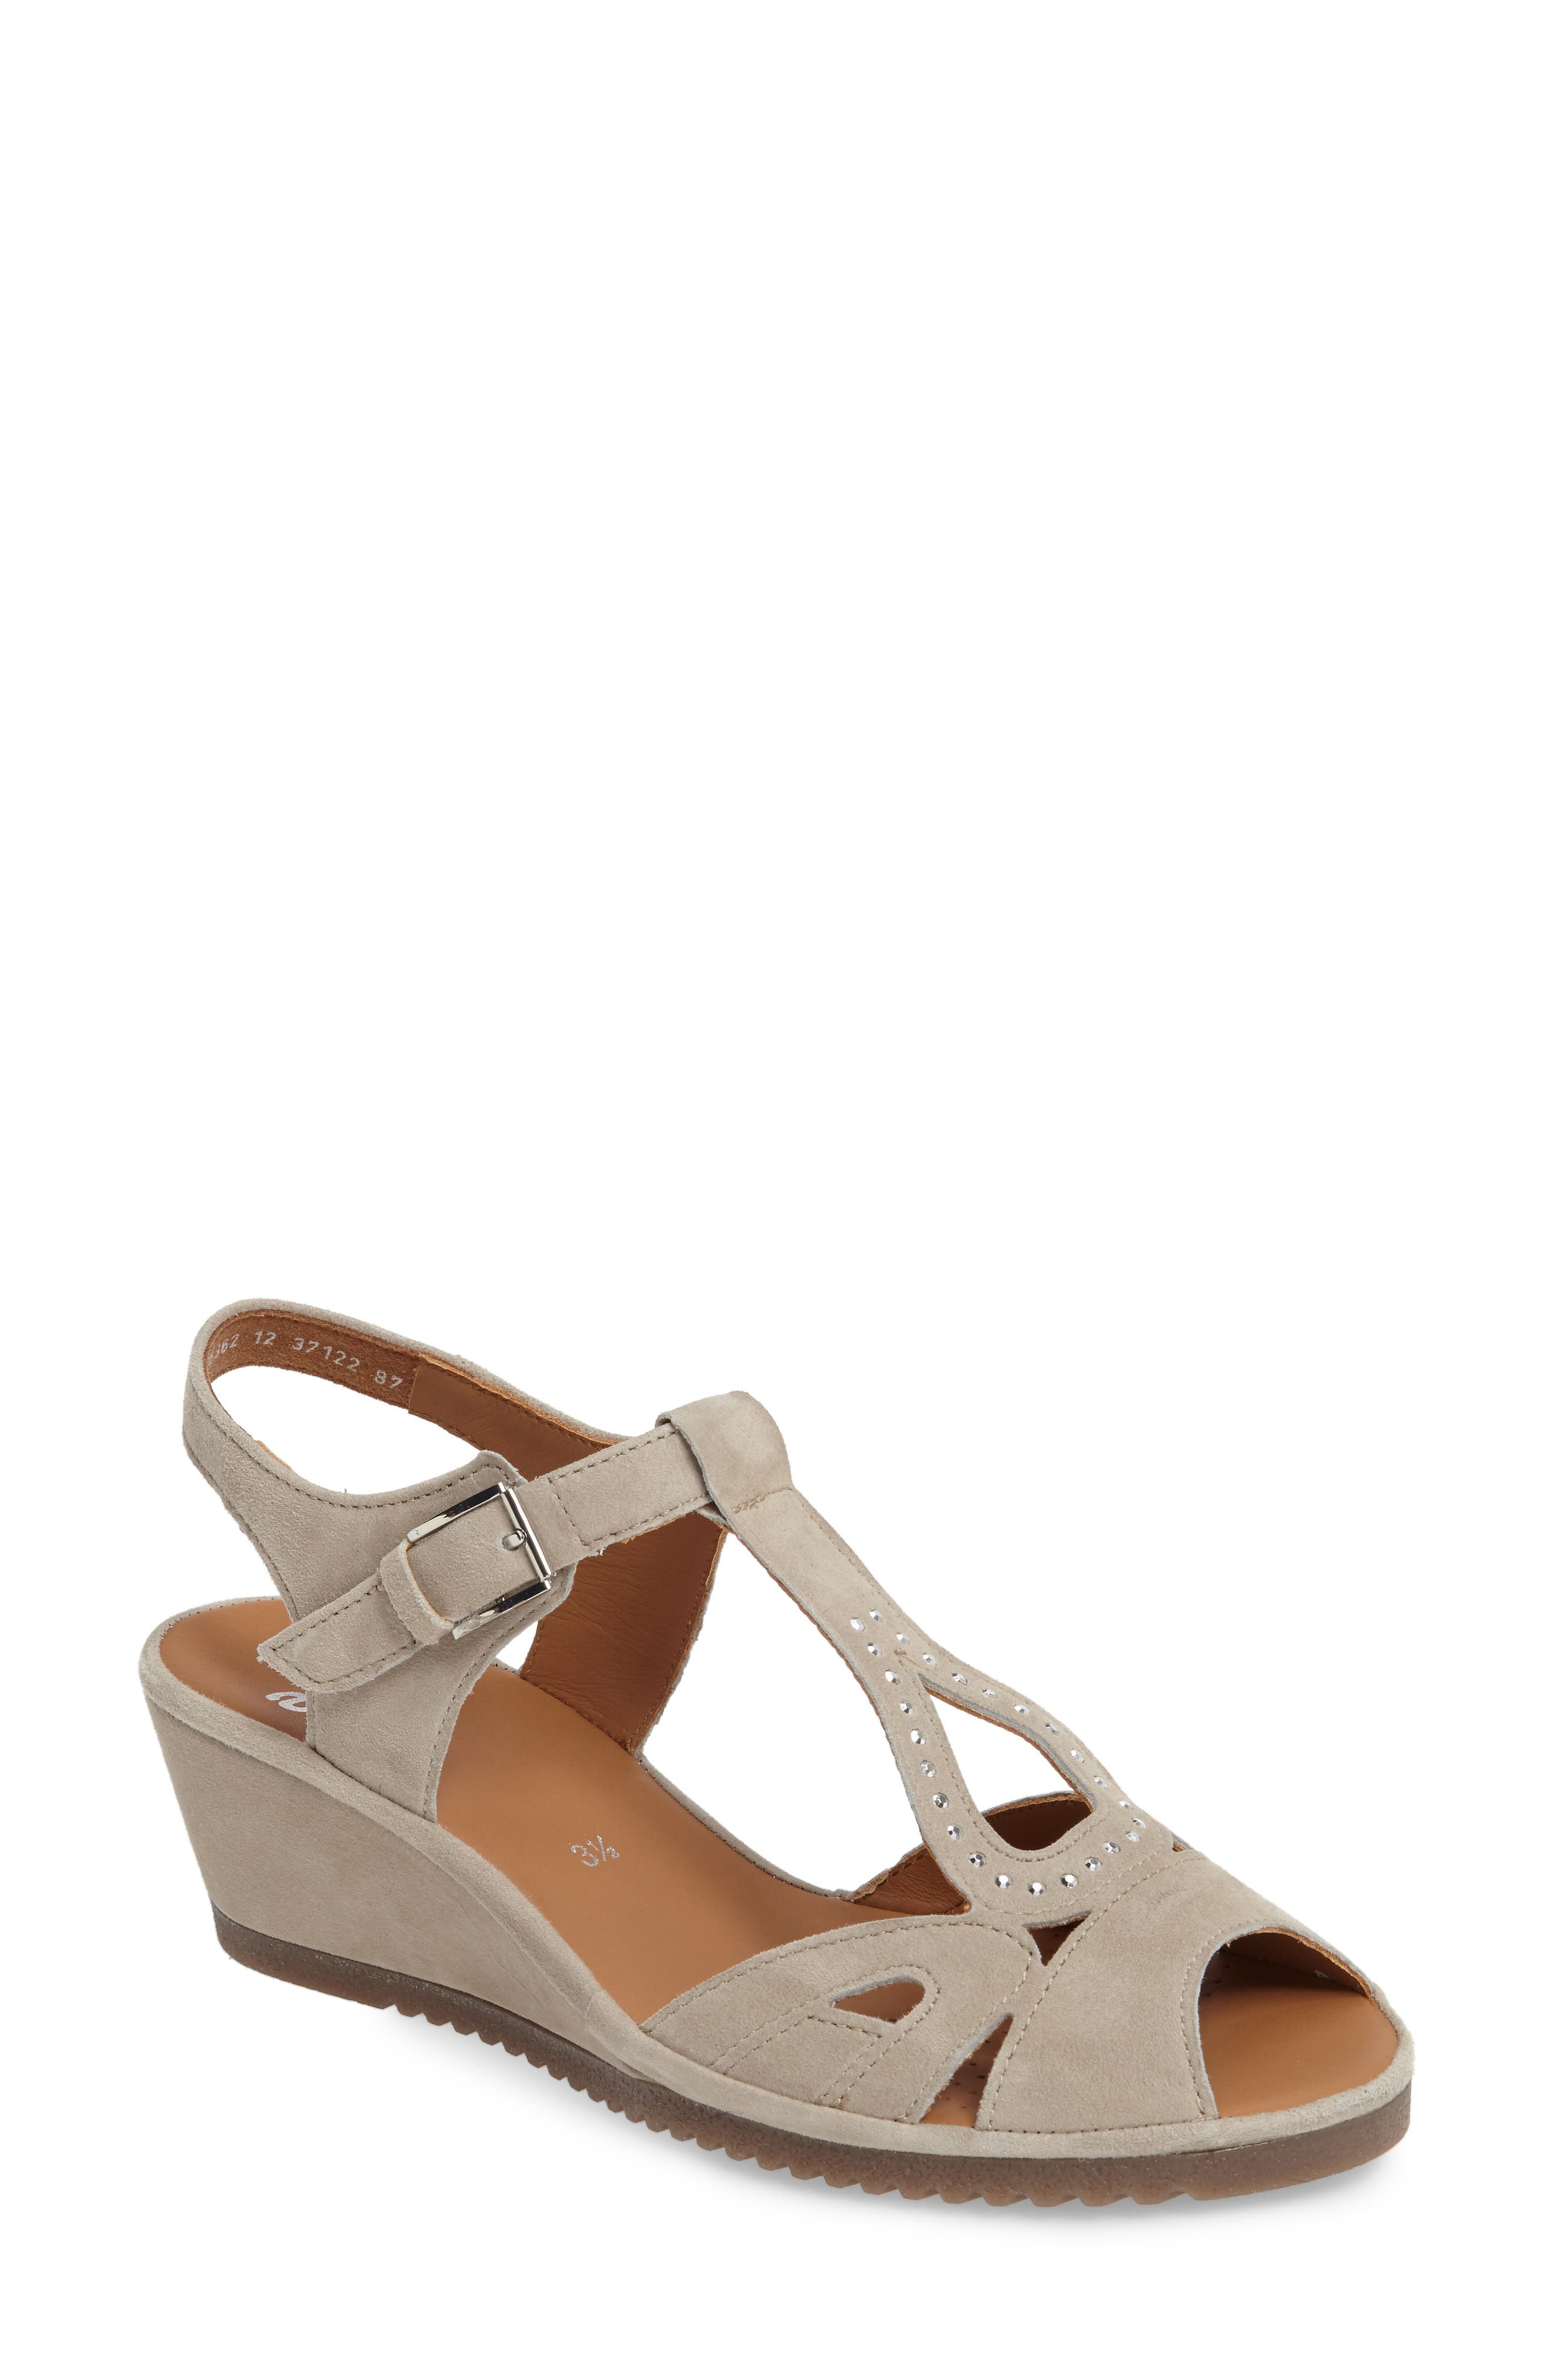 Alternate Image 1 Selected - ara Wedge Sandal (Women)